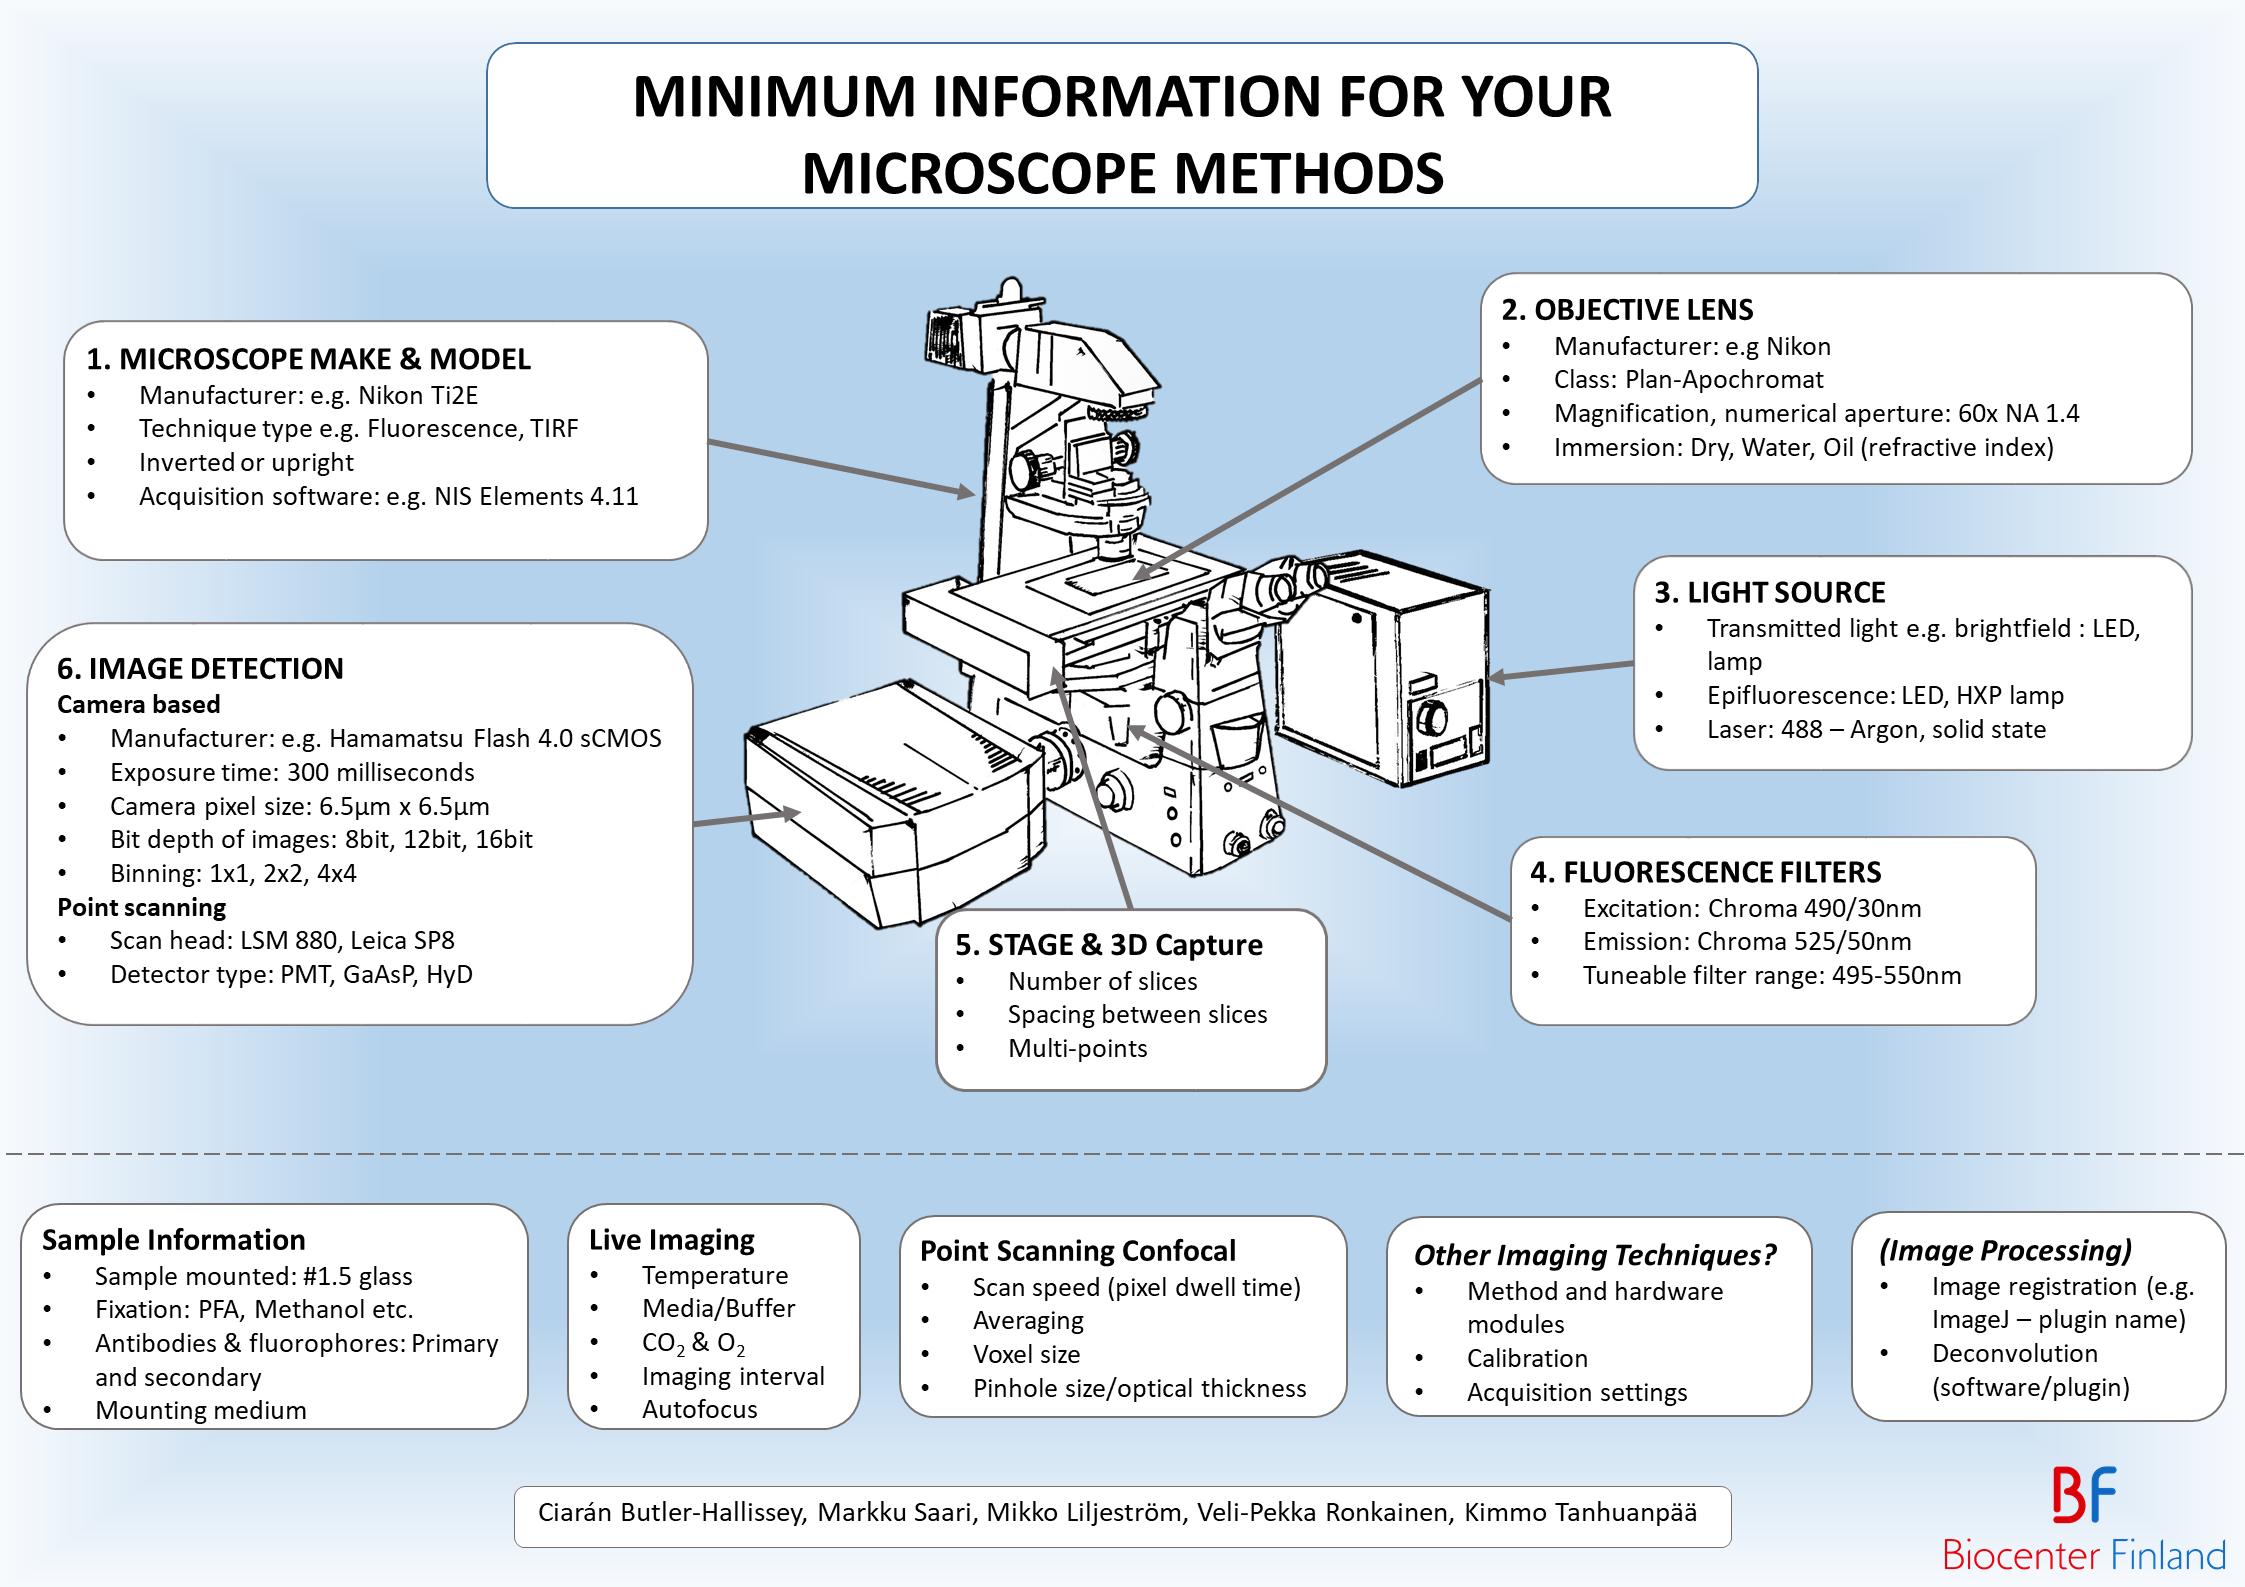 Minimum information for you microscopy methods image